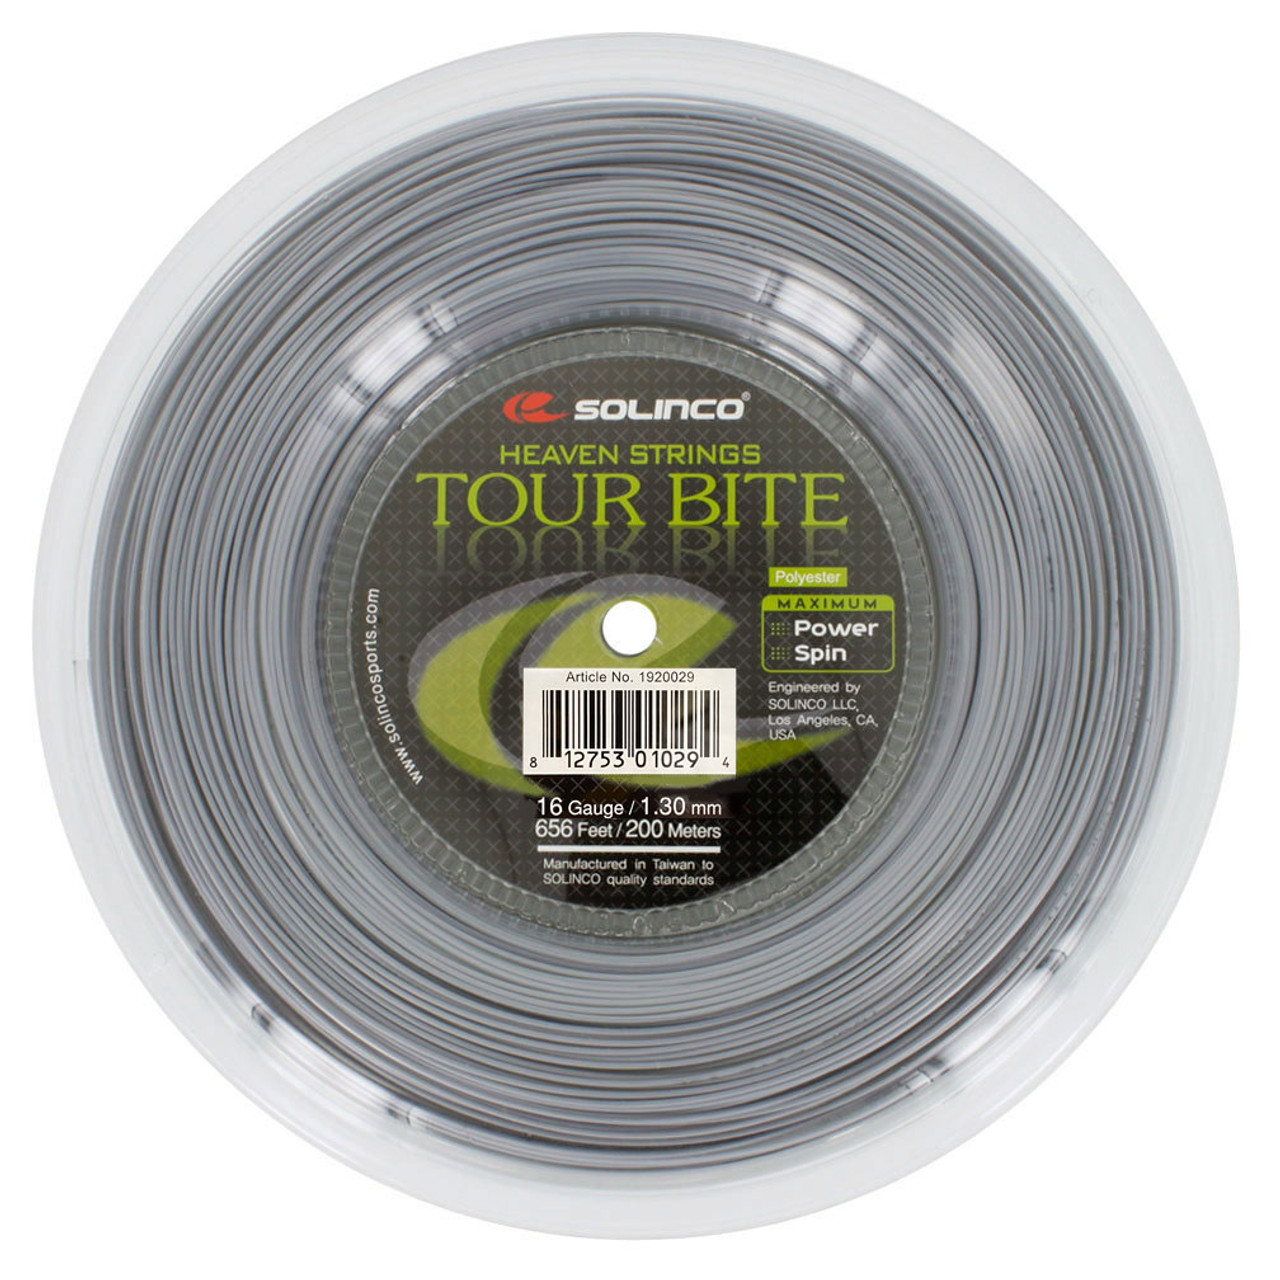 Solinco Tour Bite Soft 16 16L 17 18 tennis string set